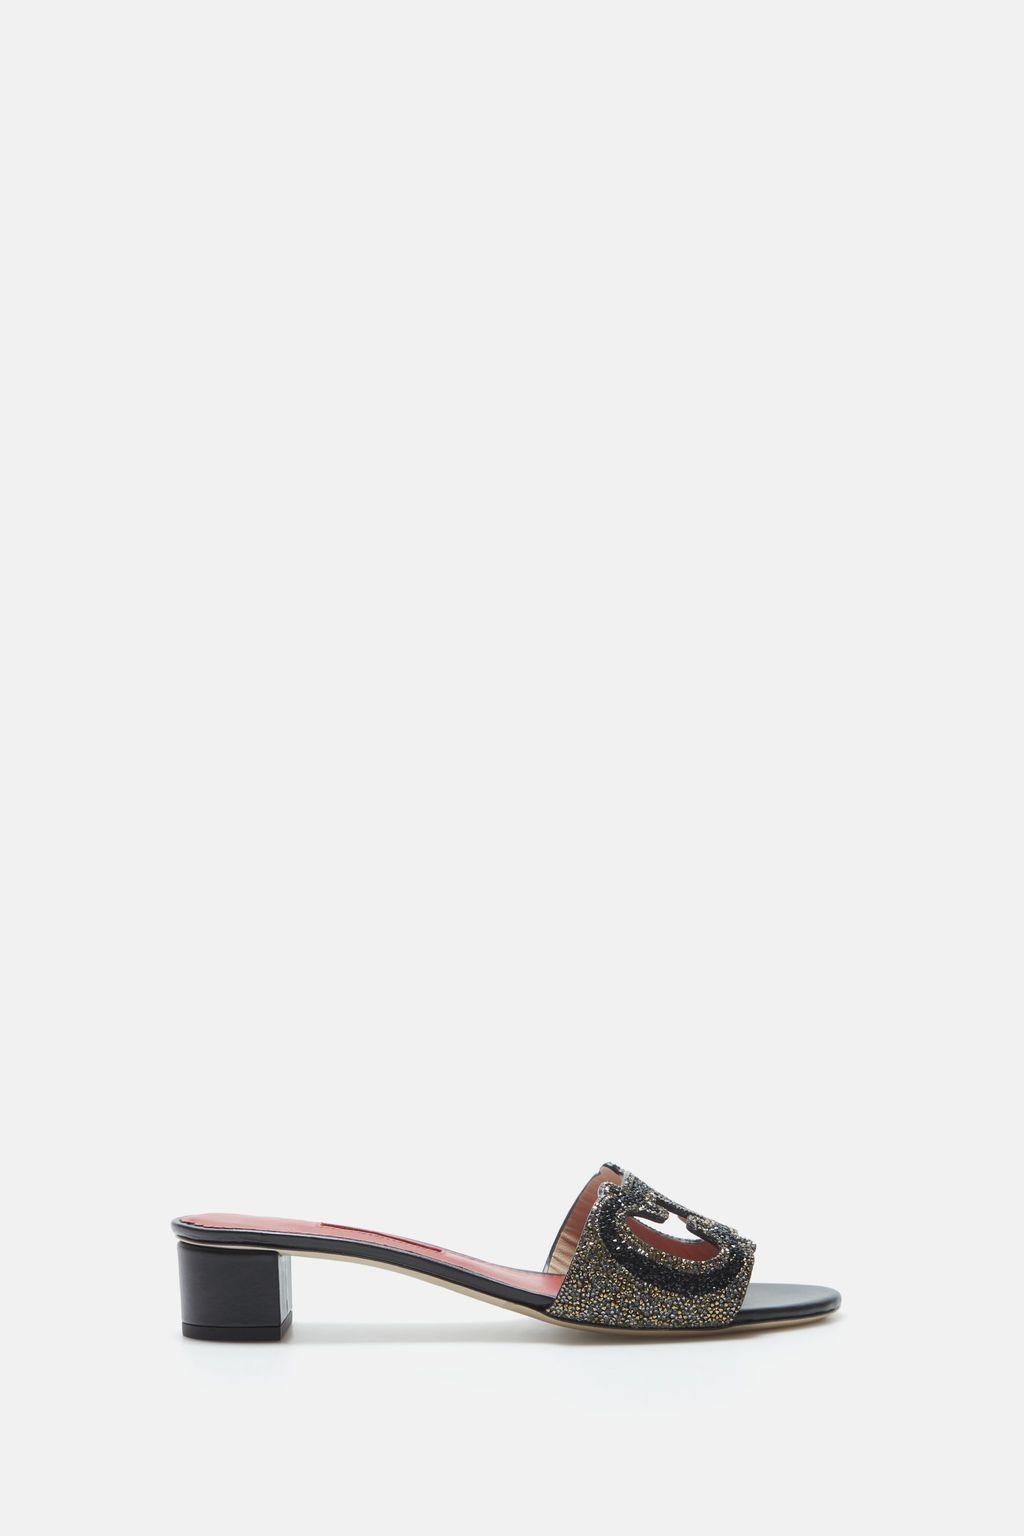 Initials Insignia cutout Napa leather sandals